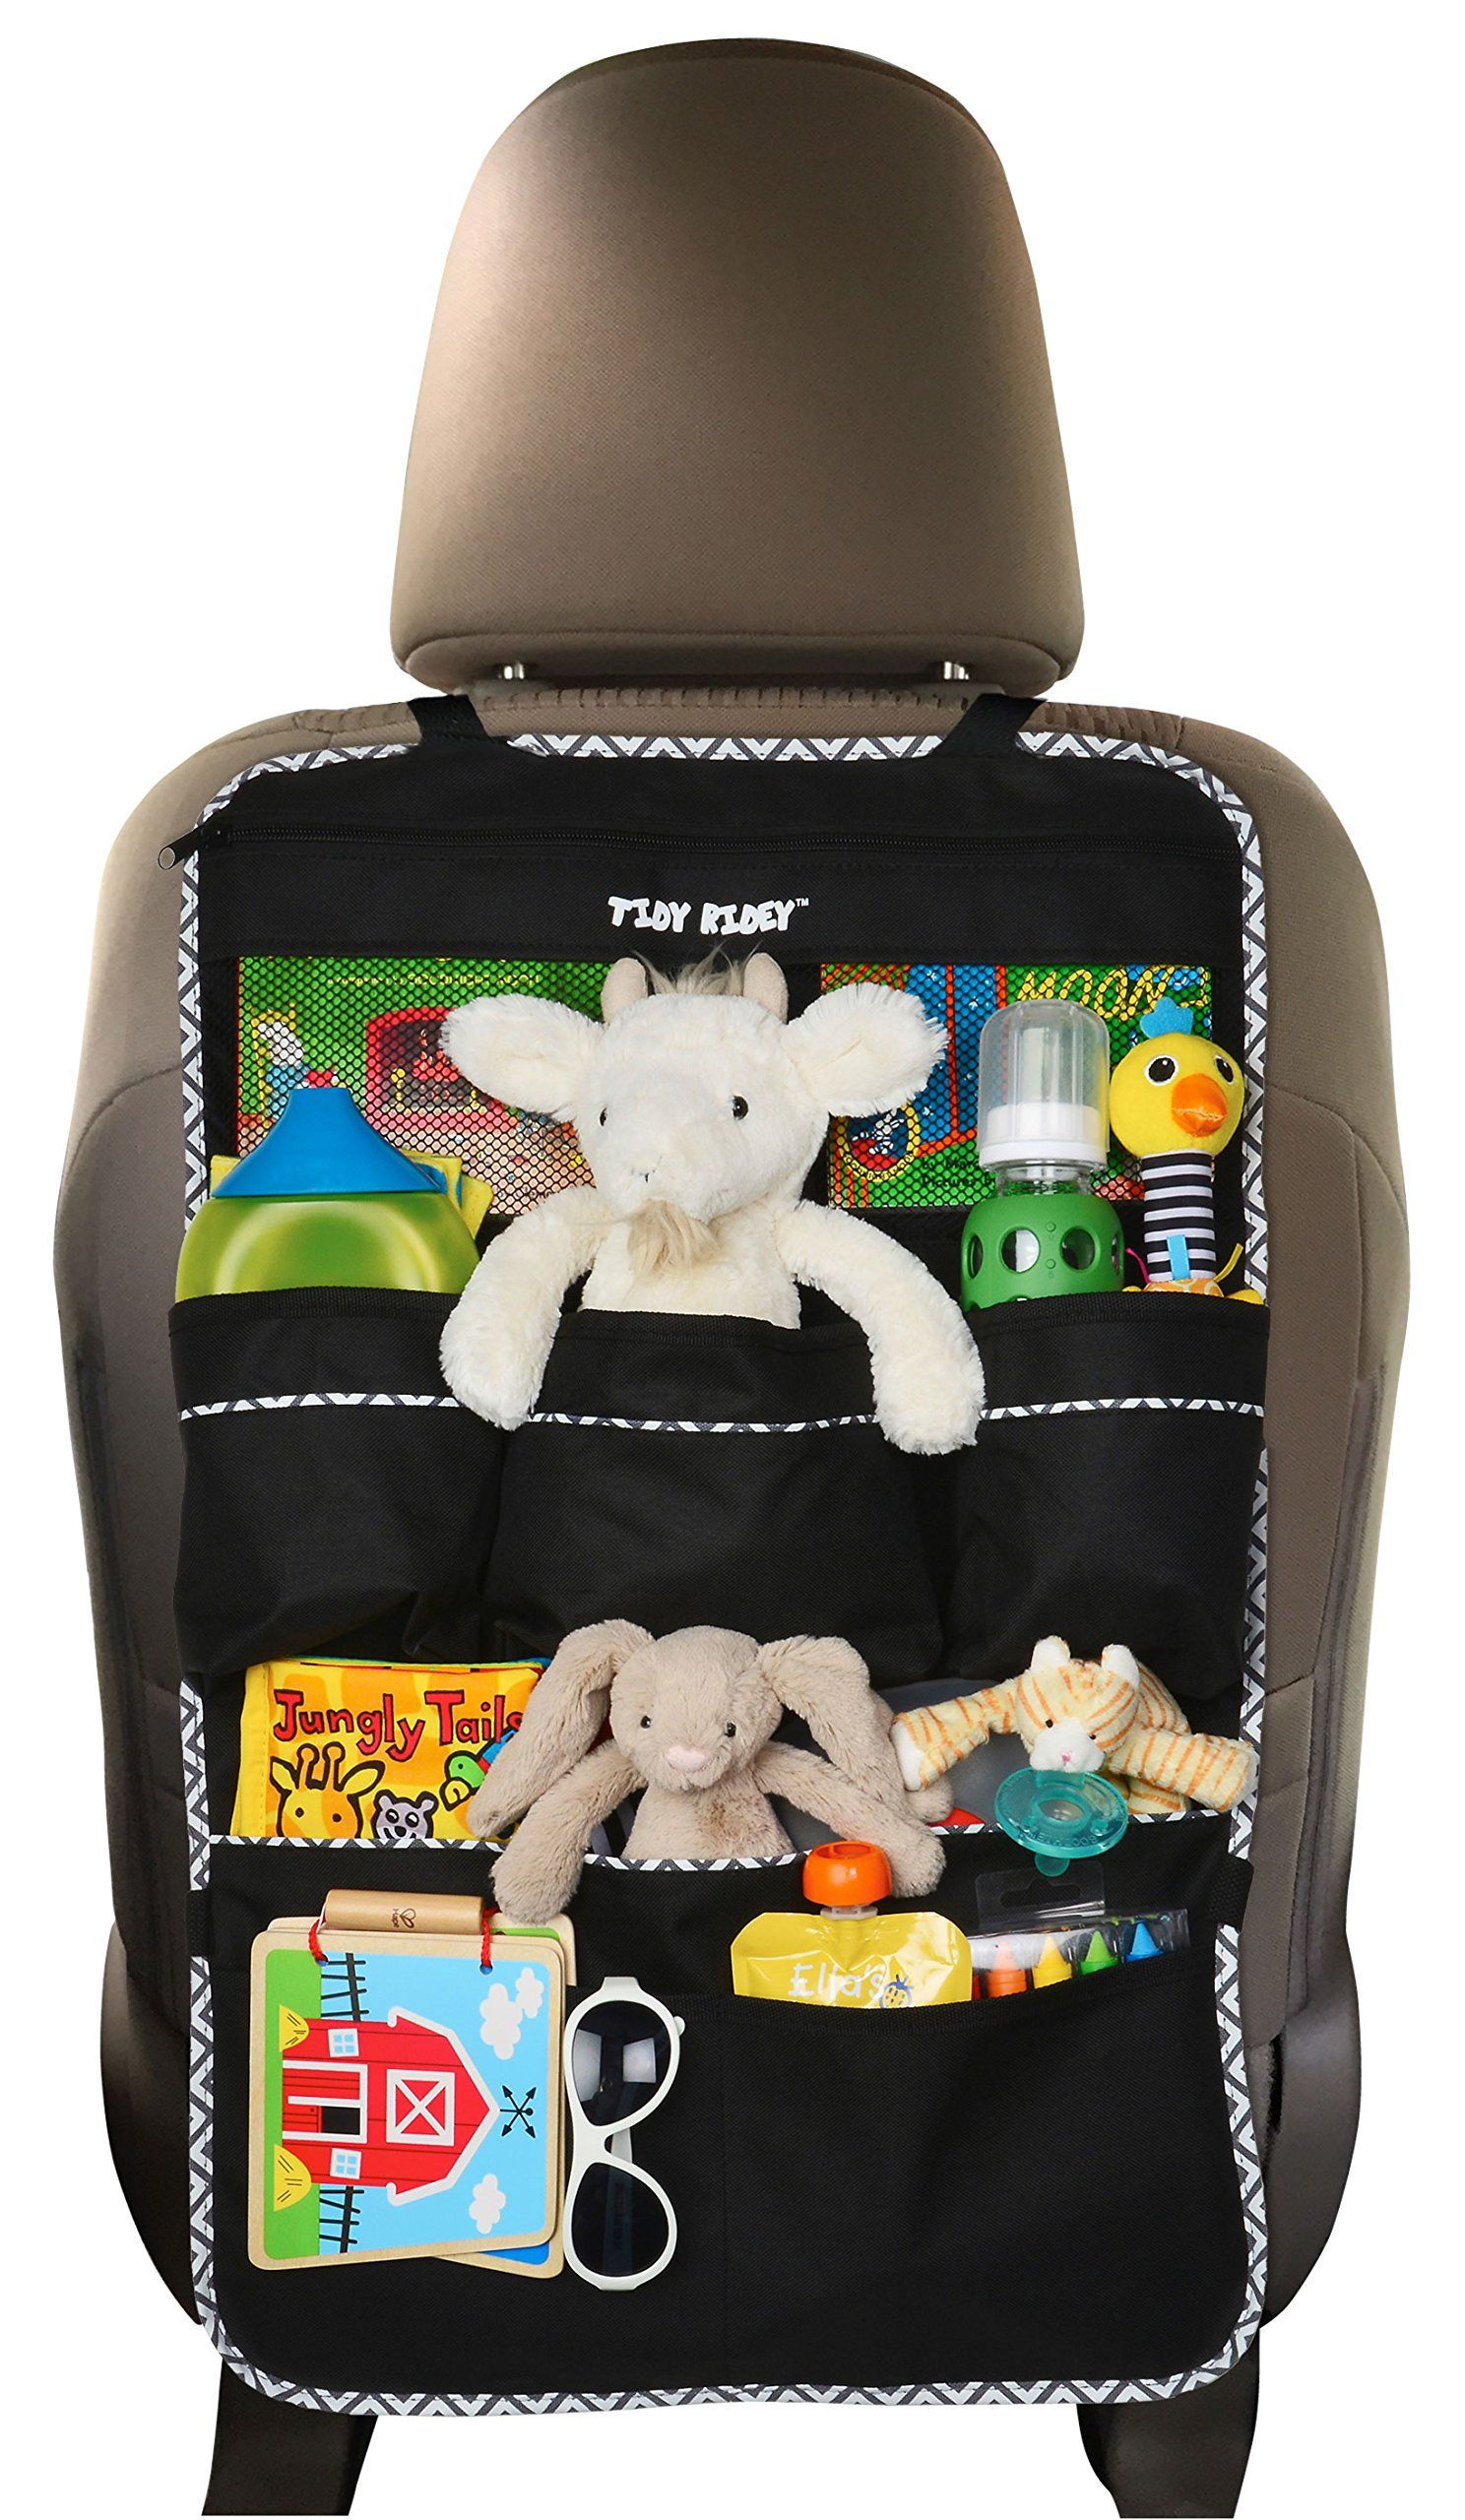 Premium Backseat Organizer for Kids, Cars EXTRA Large